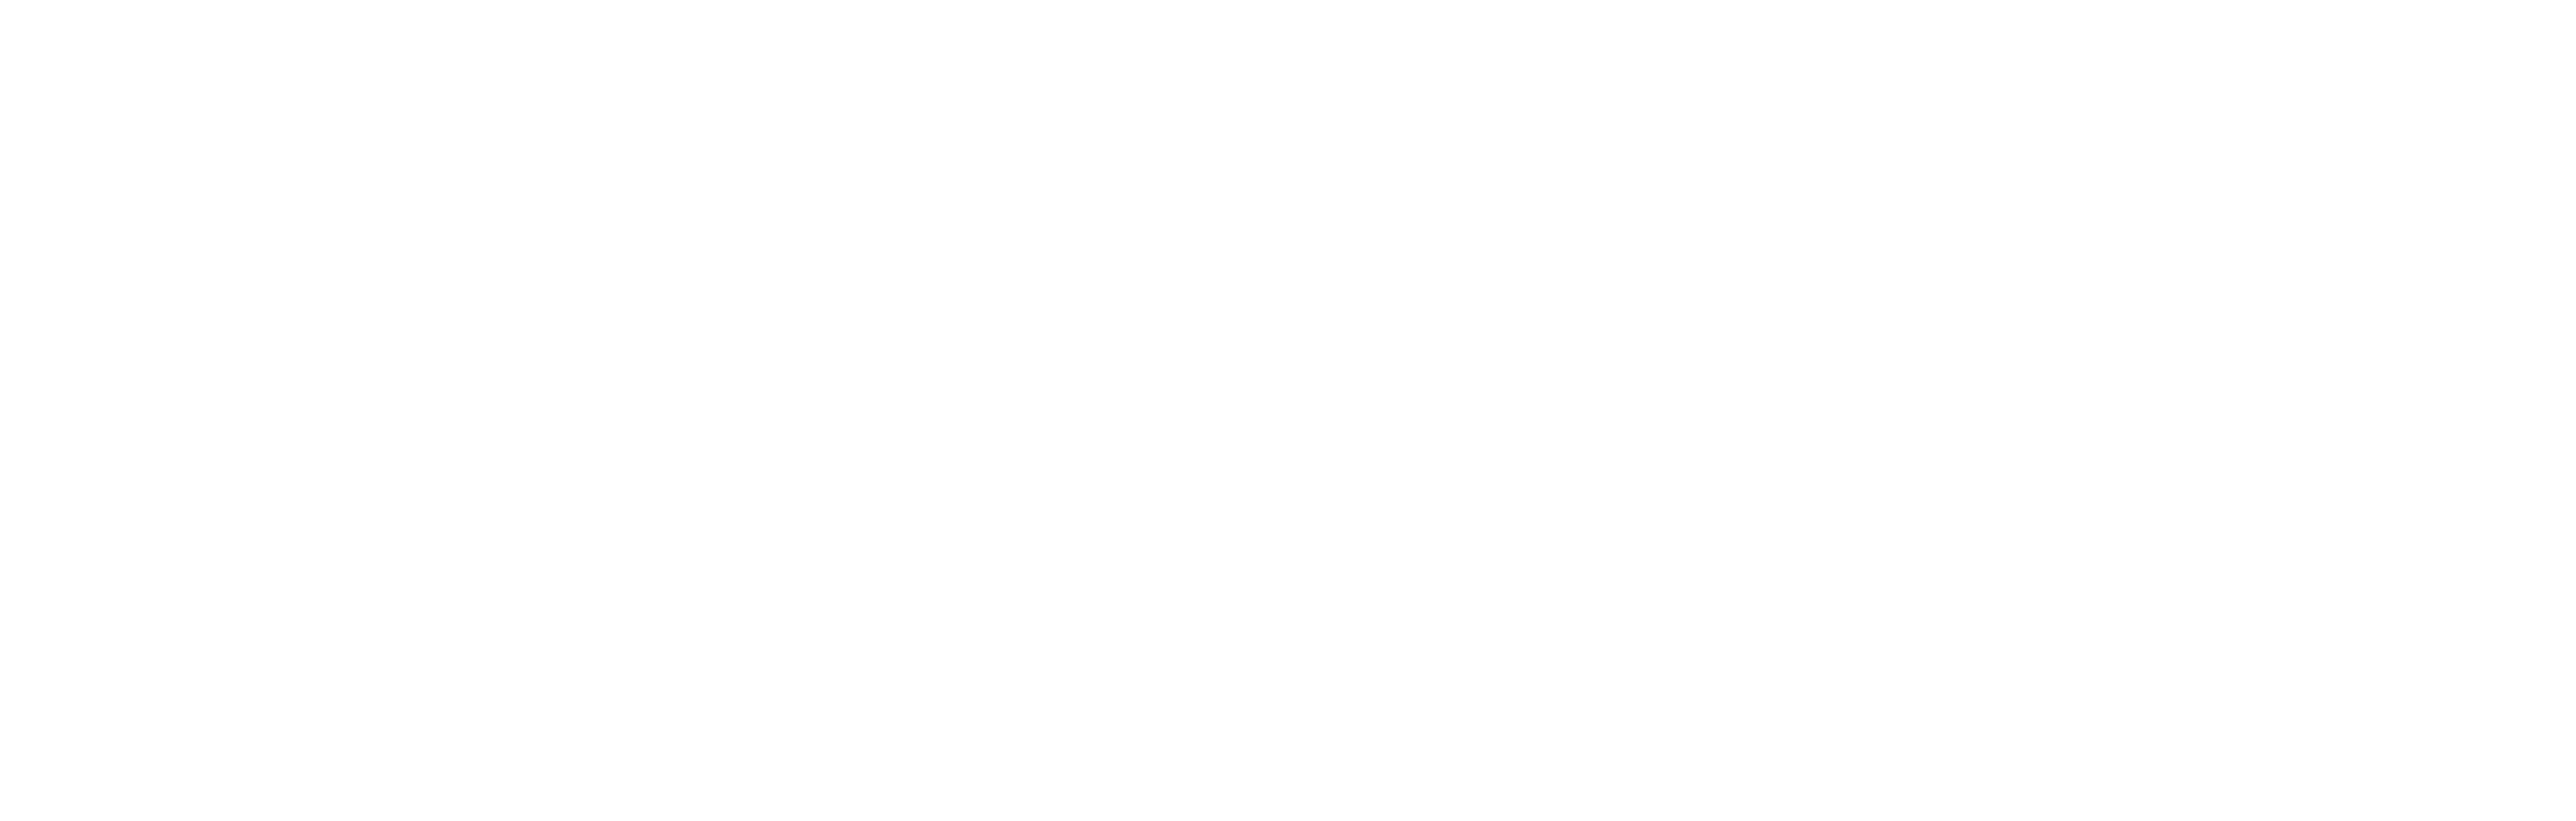 SET Dřez SCHOCK Formhaus D-100 Croma + baterie Cosmo Chrom 525001